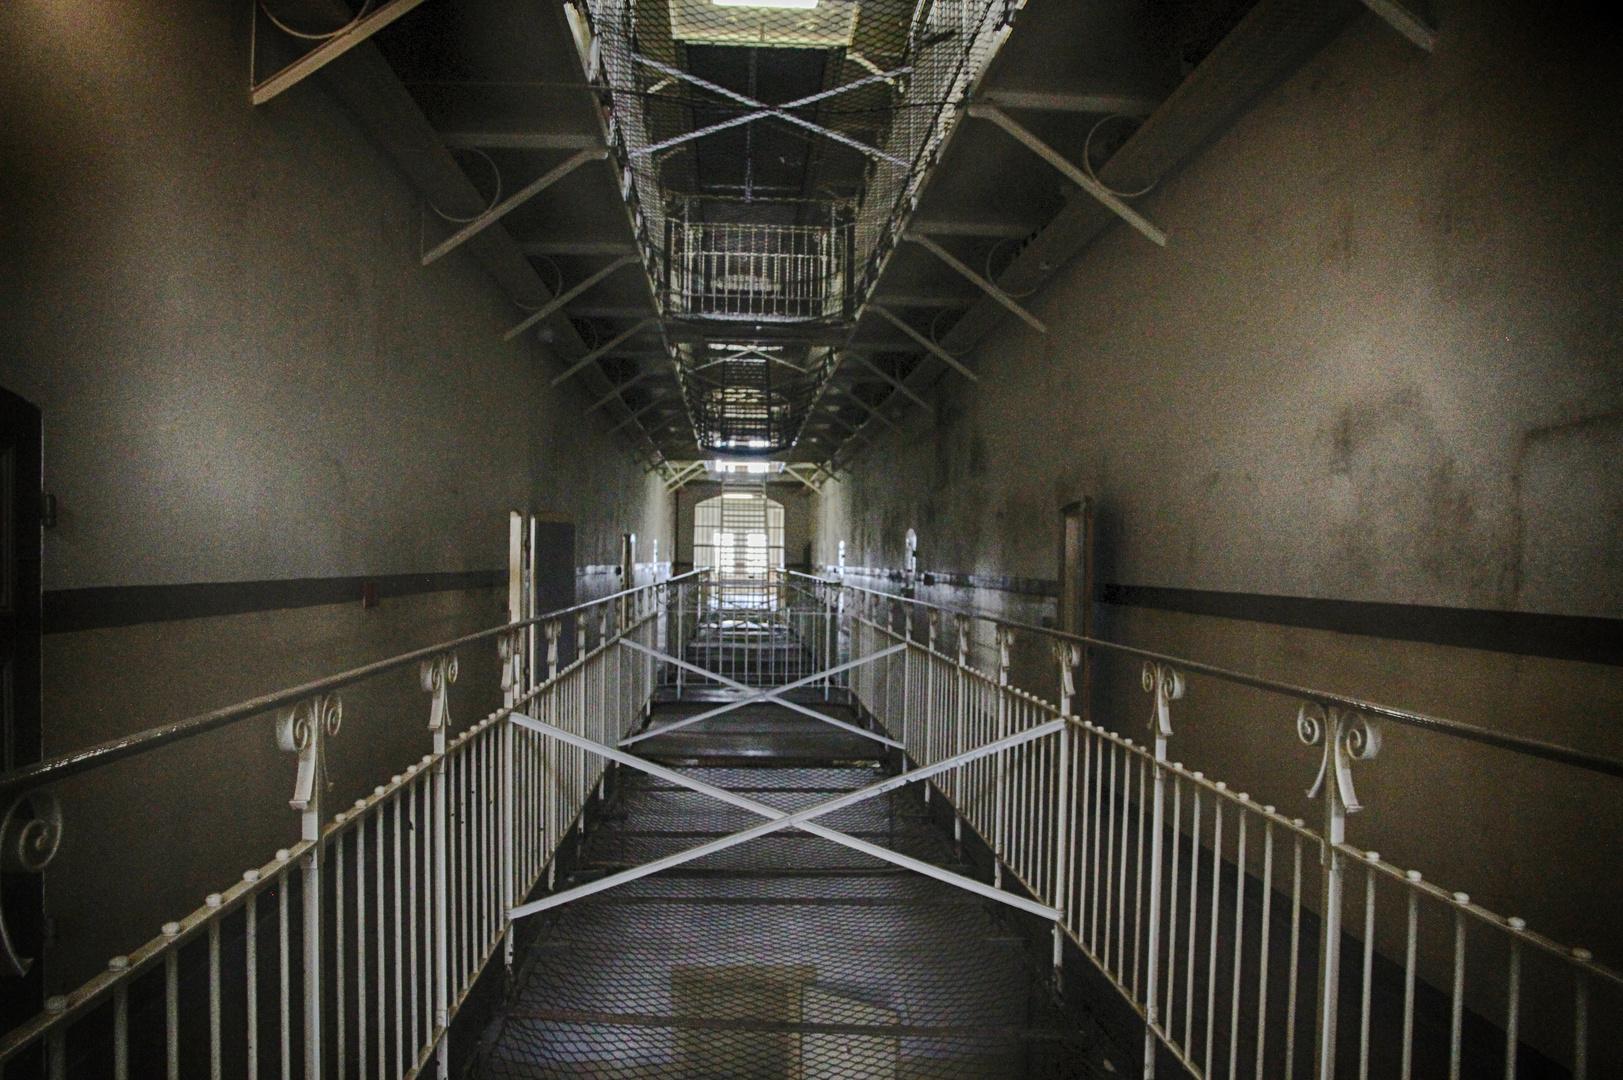 Frauengefängnis Hoheneck 2